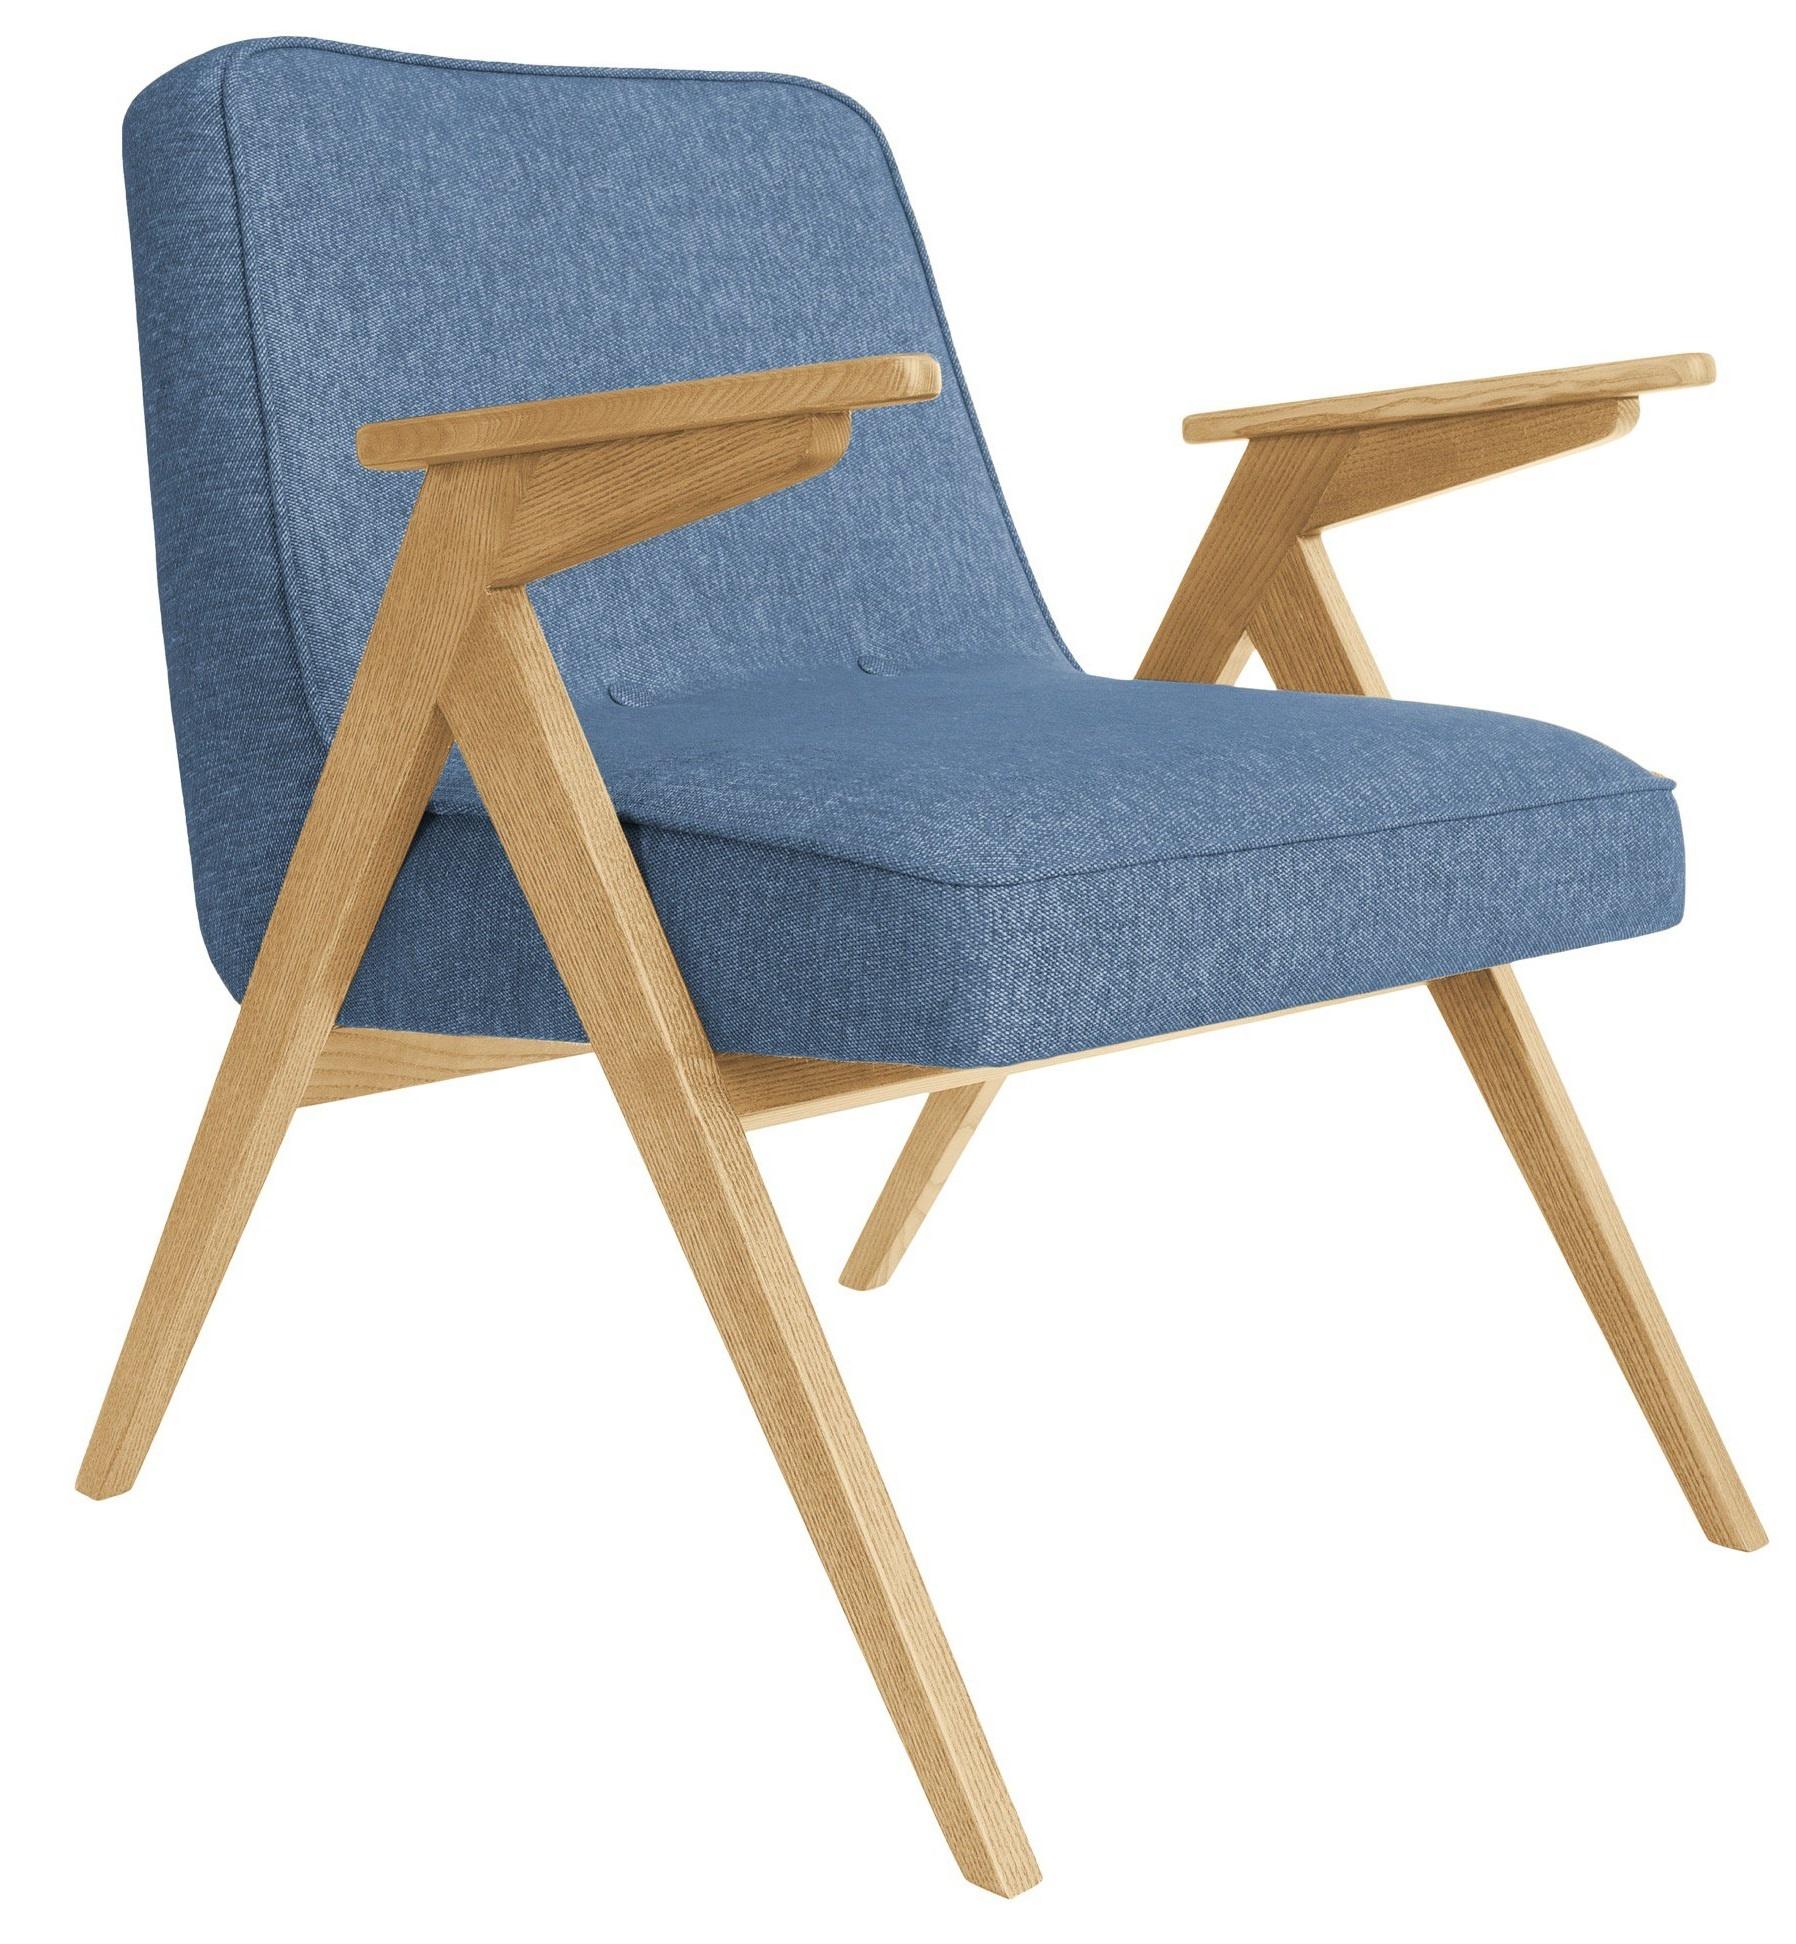 Remarkable 366 Concept Bunny Lounge Stoel Creativecarmelina Interior Chair Design Creativecarmelinacom